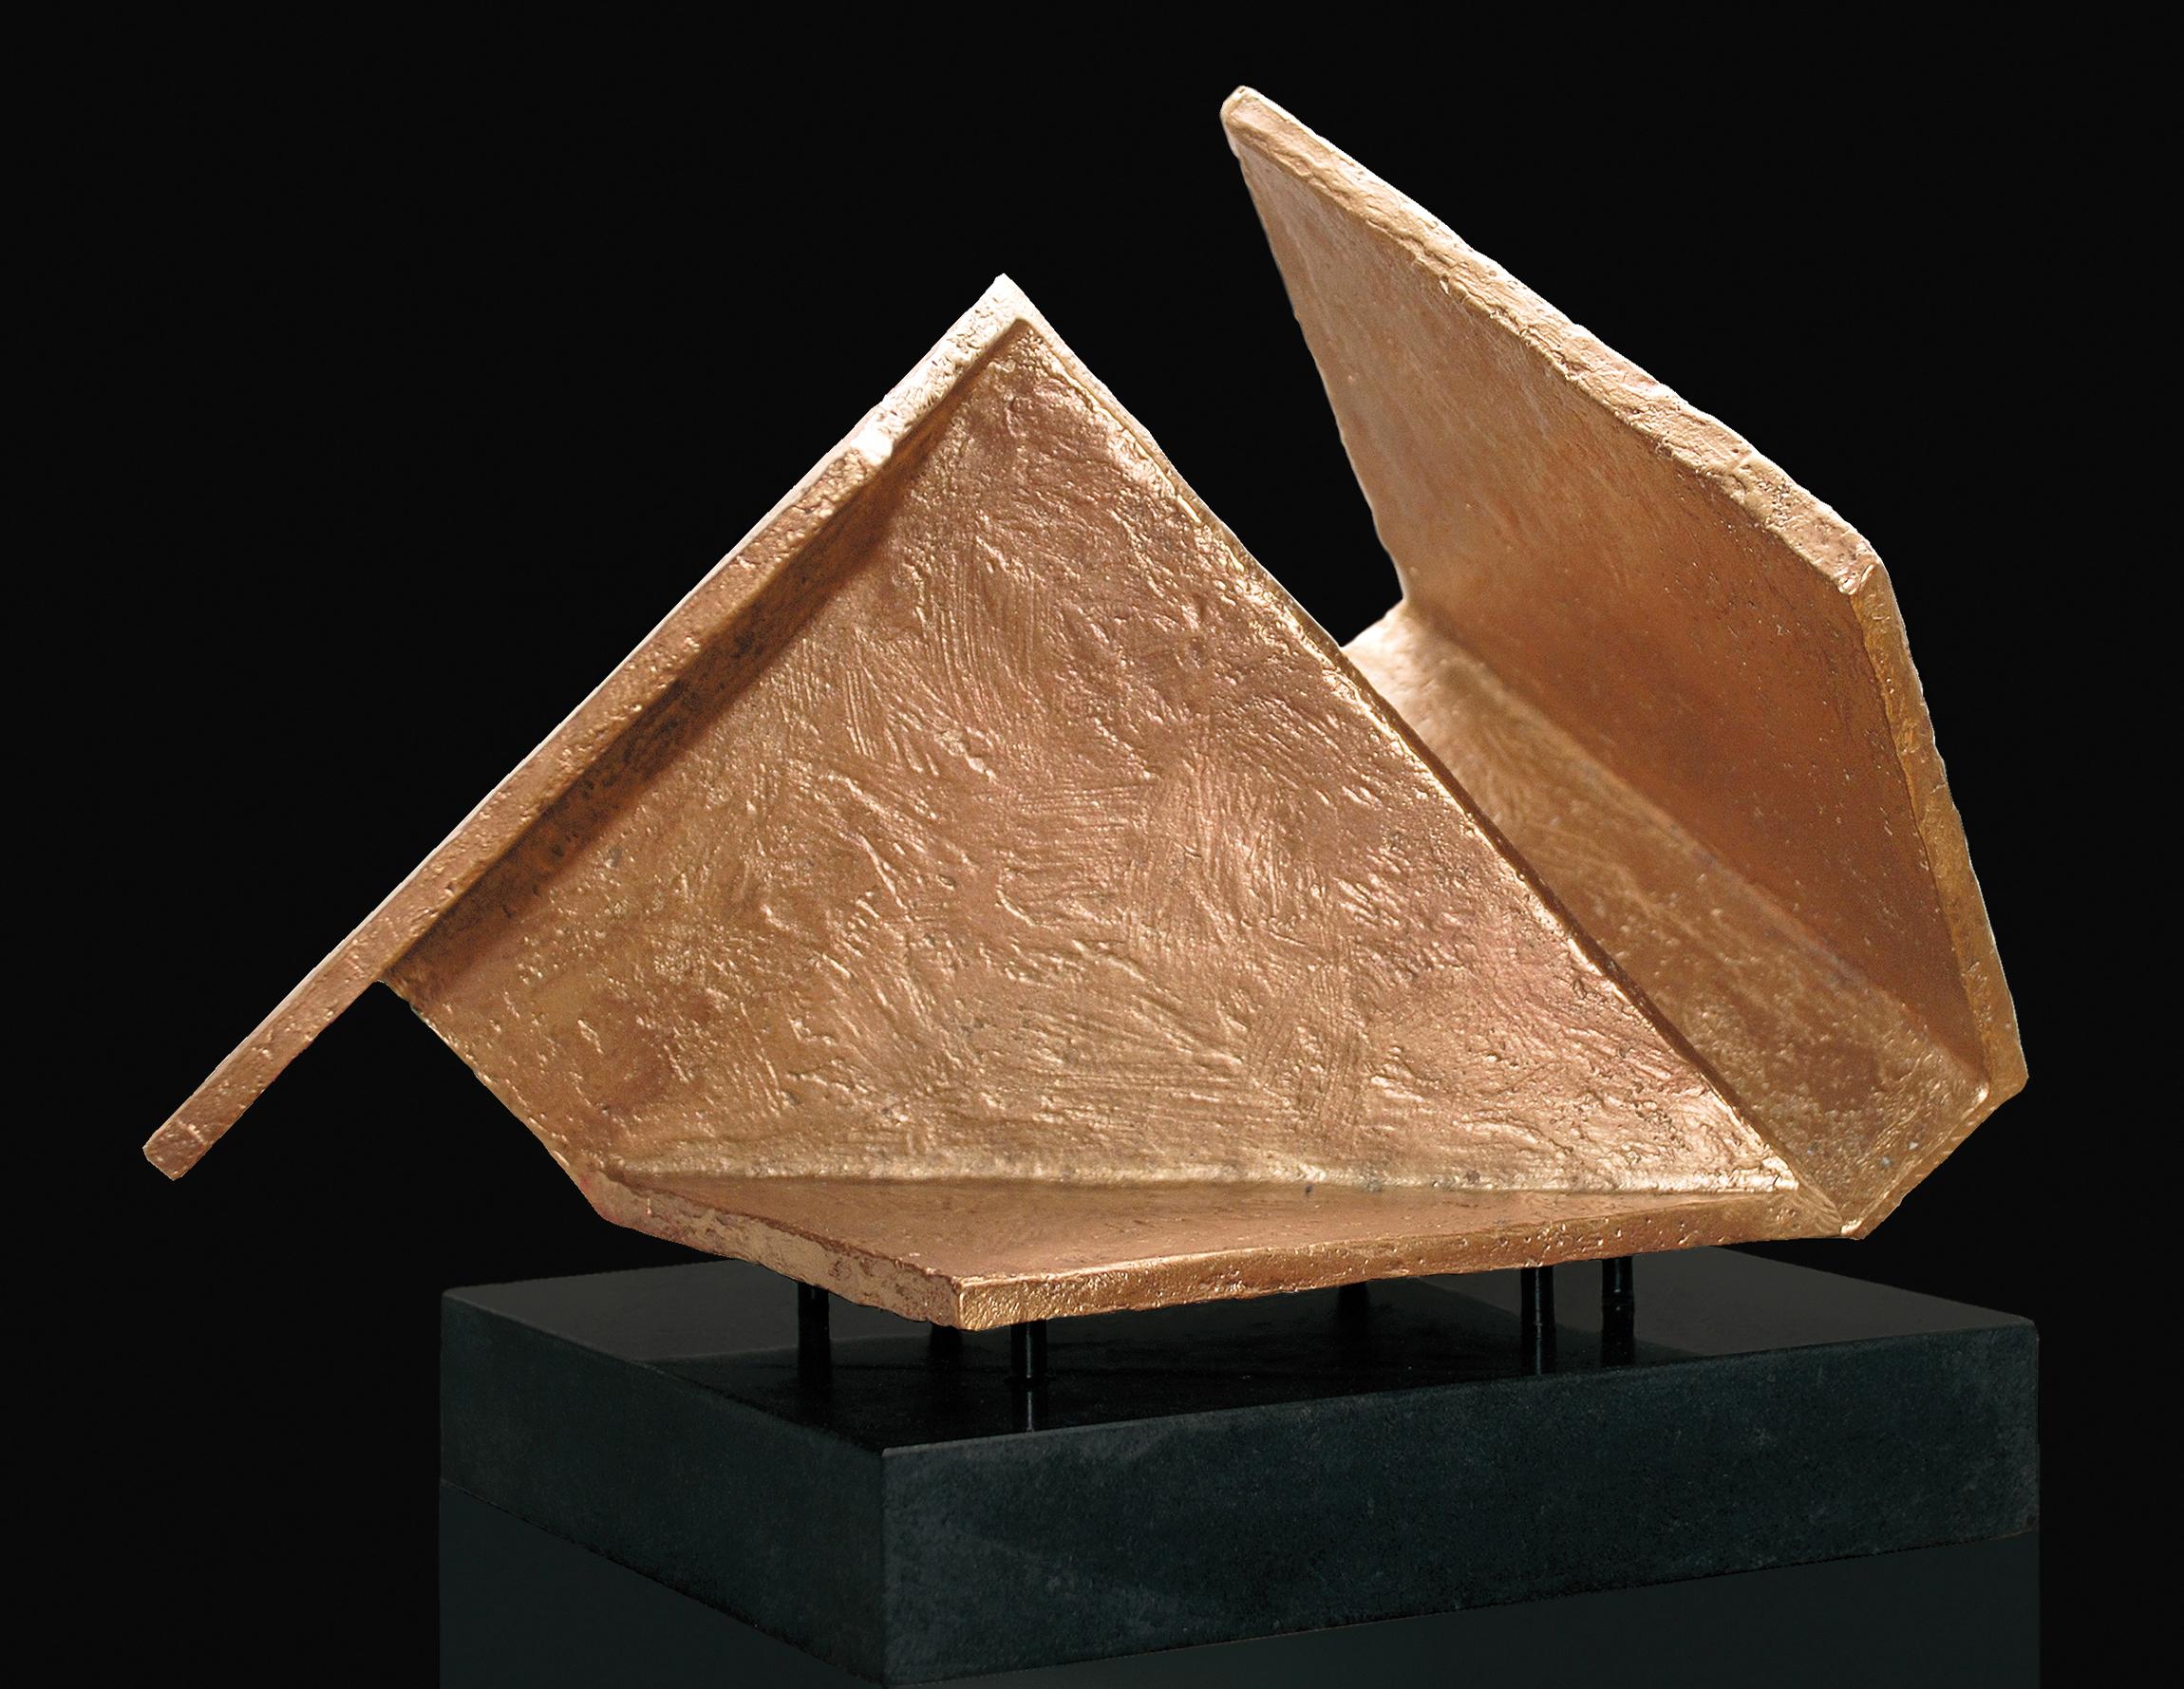 13. motiv, länge 27 cm, bronze